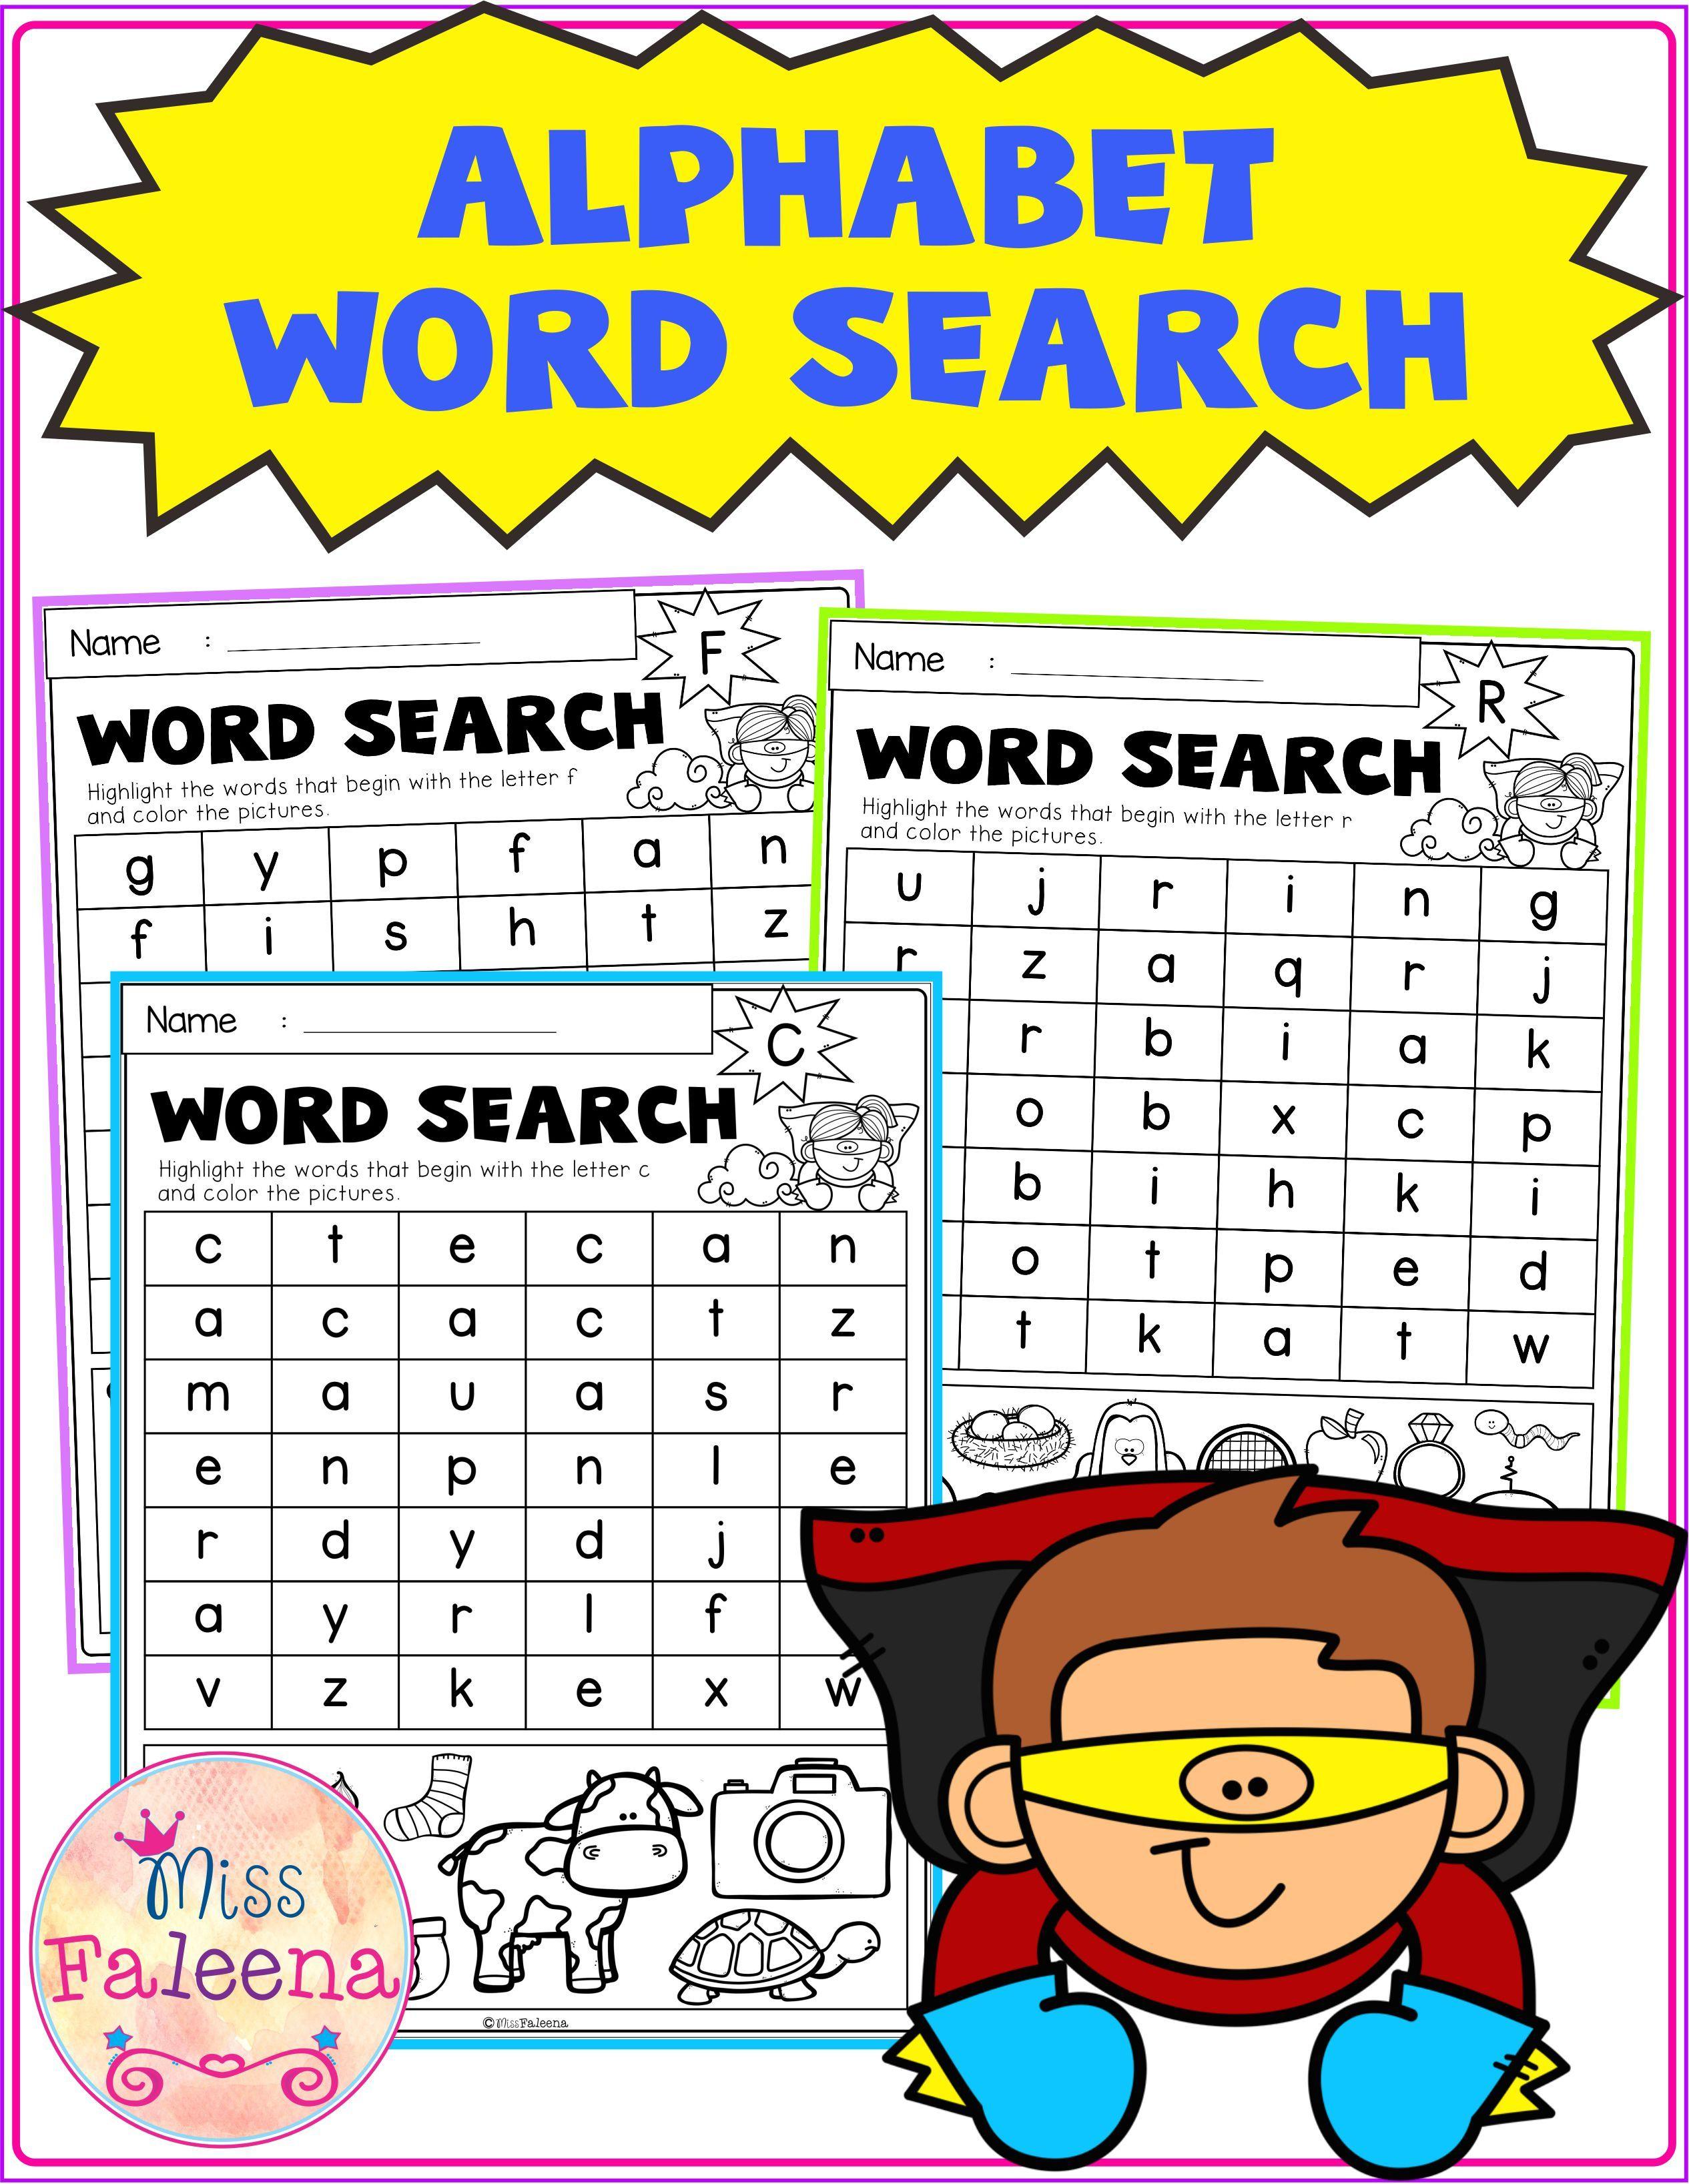 Alphabet Word Search